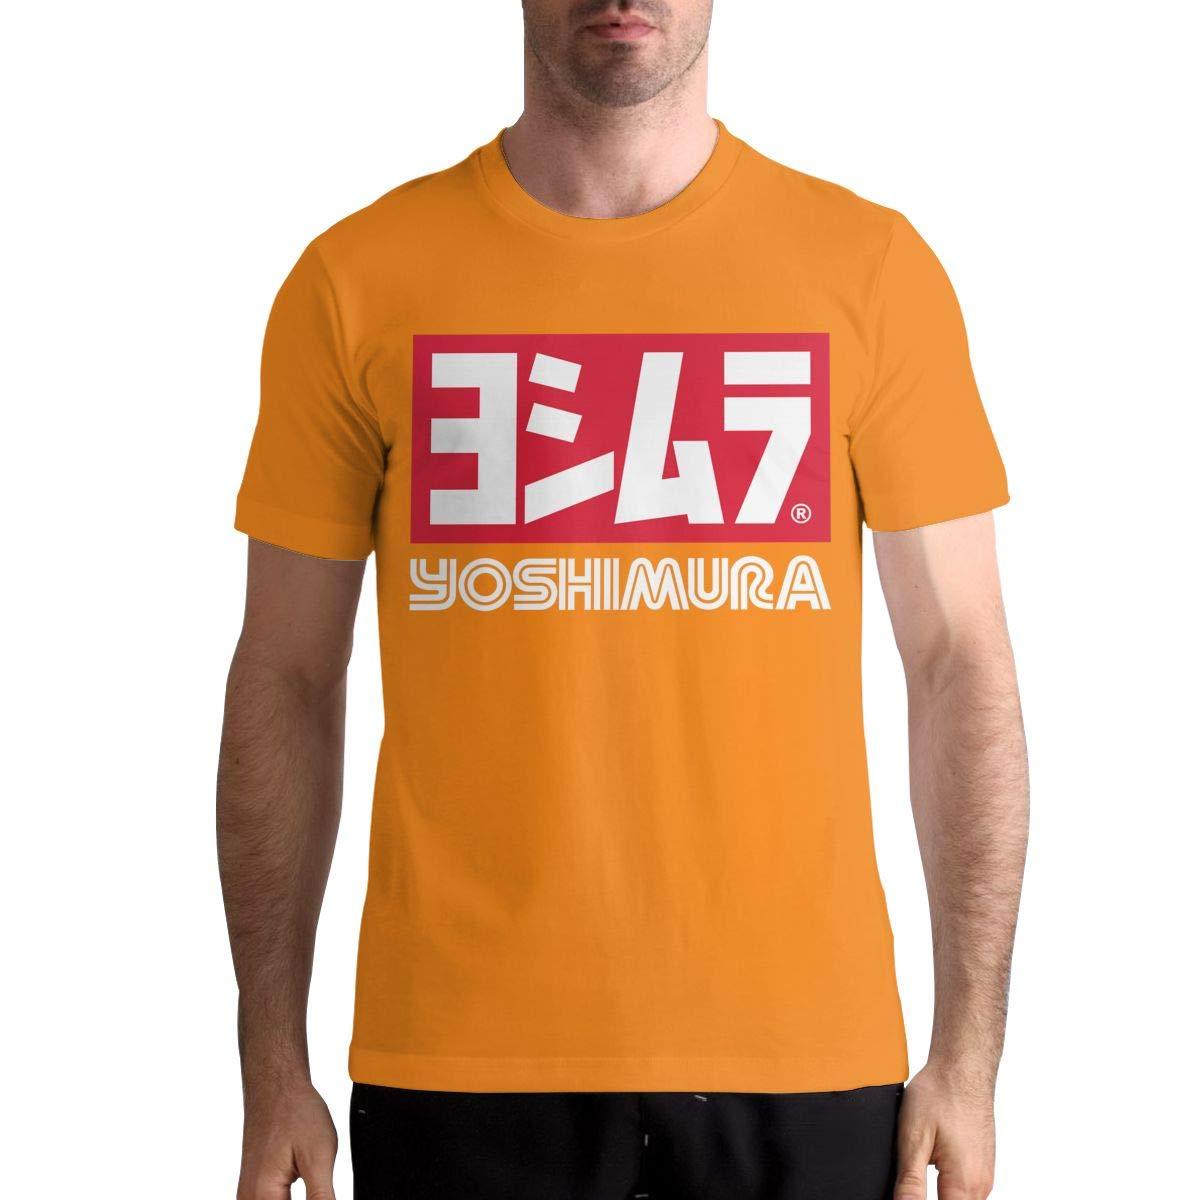 Thomlarryca Yoshimura Classic Leisure T Shirts For Black